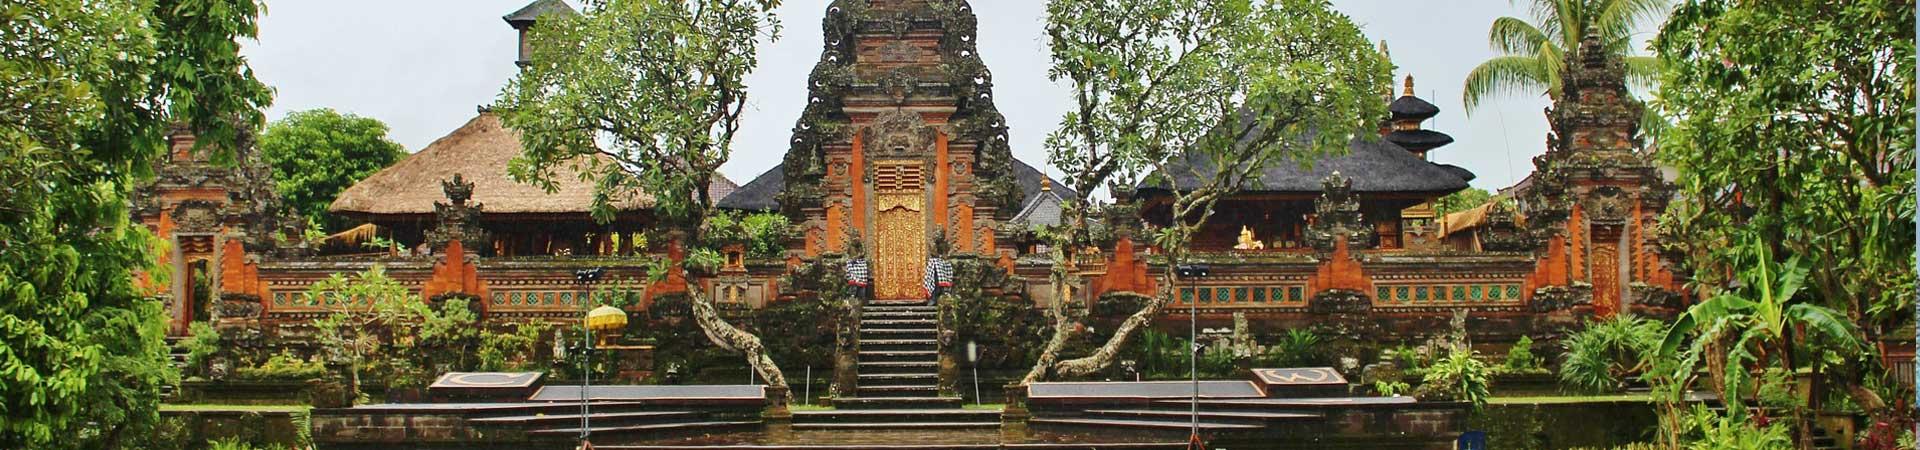 4D3N Bali Escape